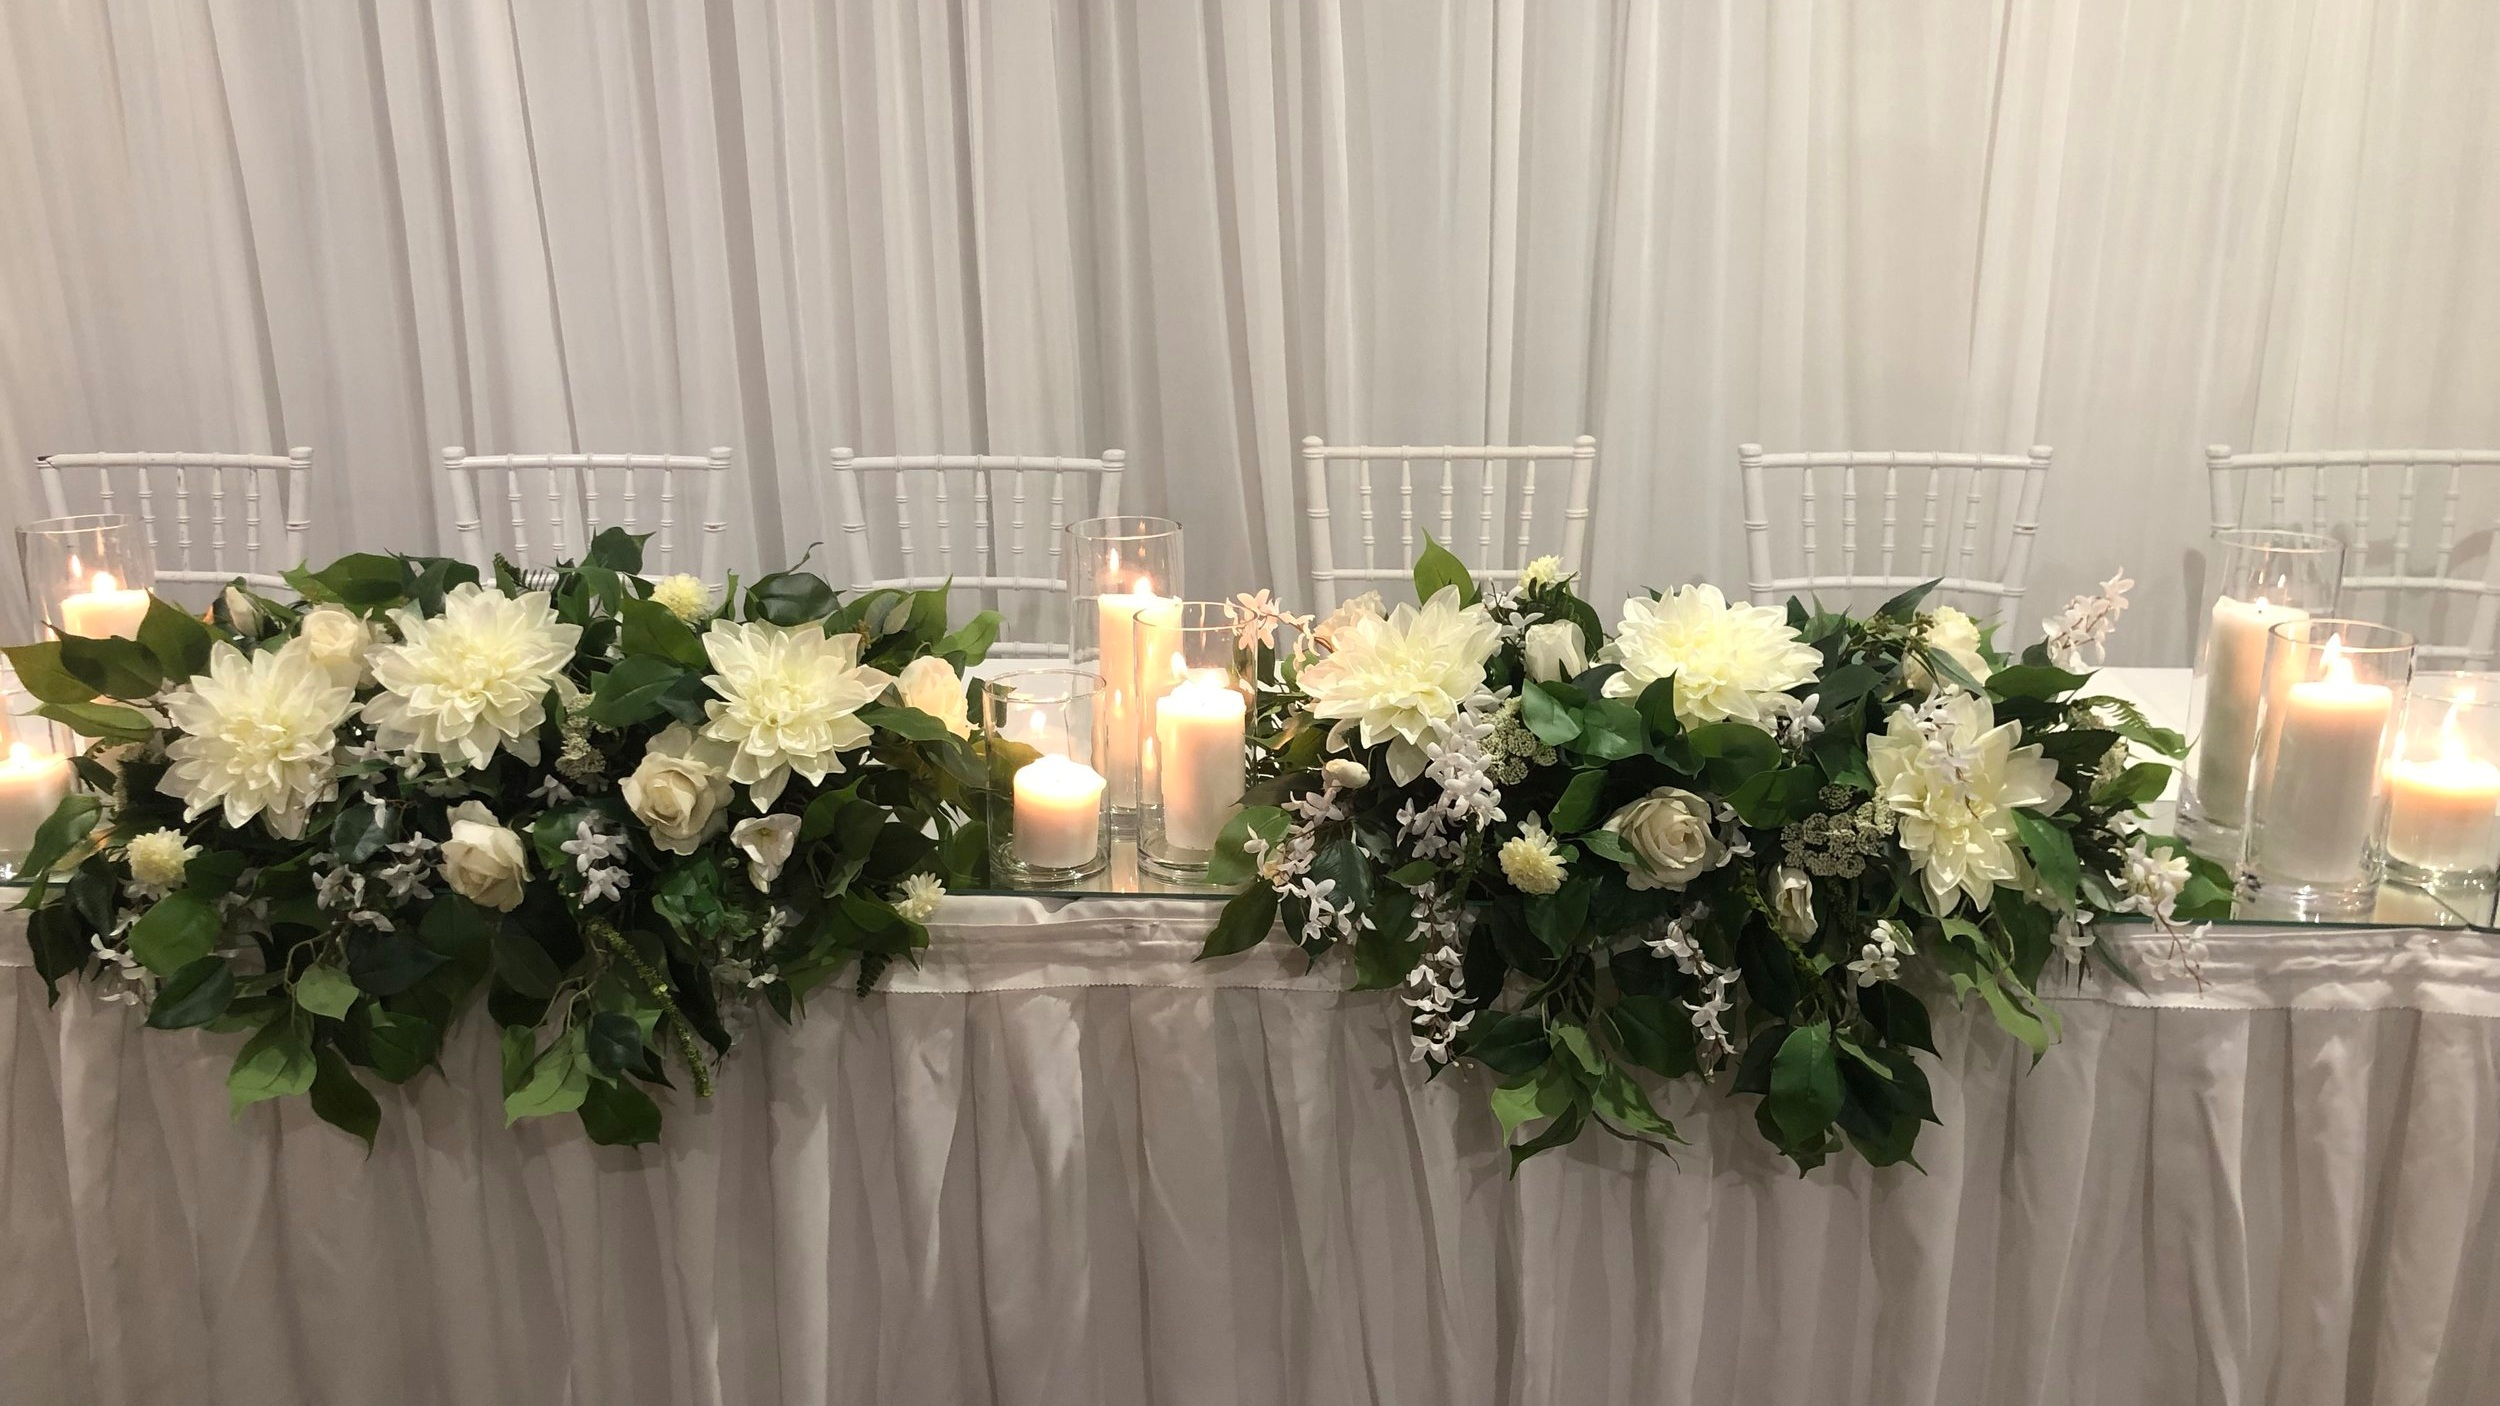 Standard Ann bridal table decor including pillar candle upgrade